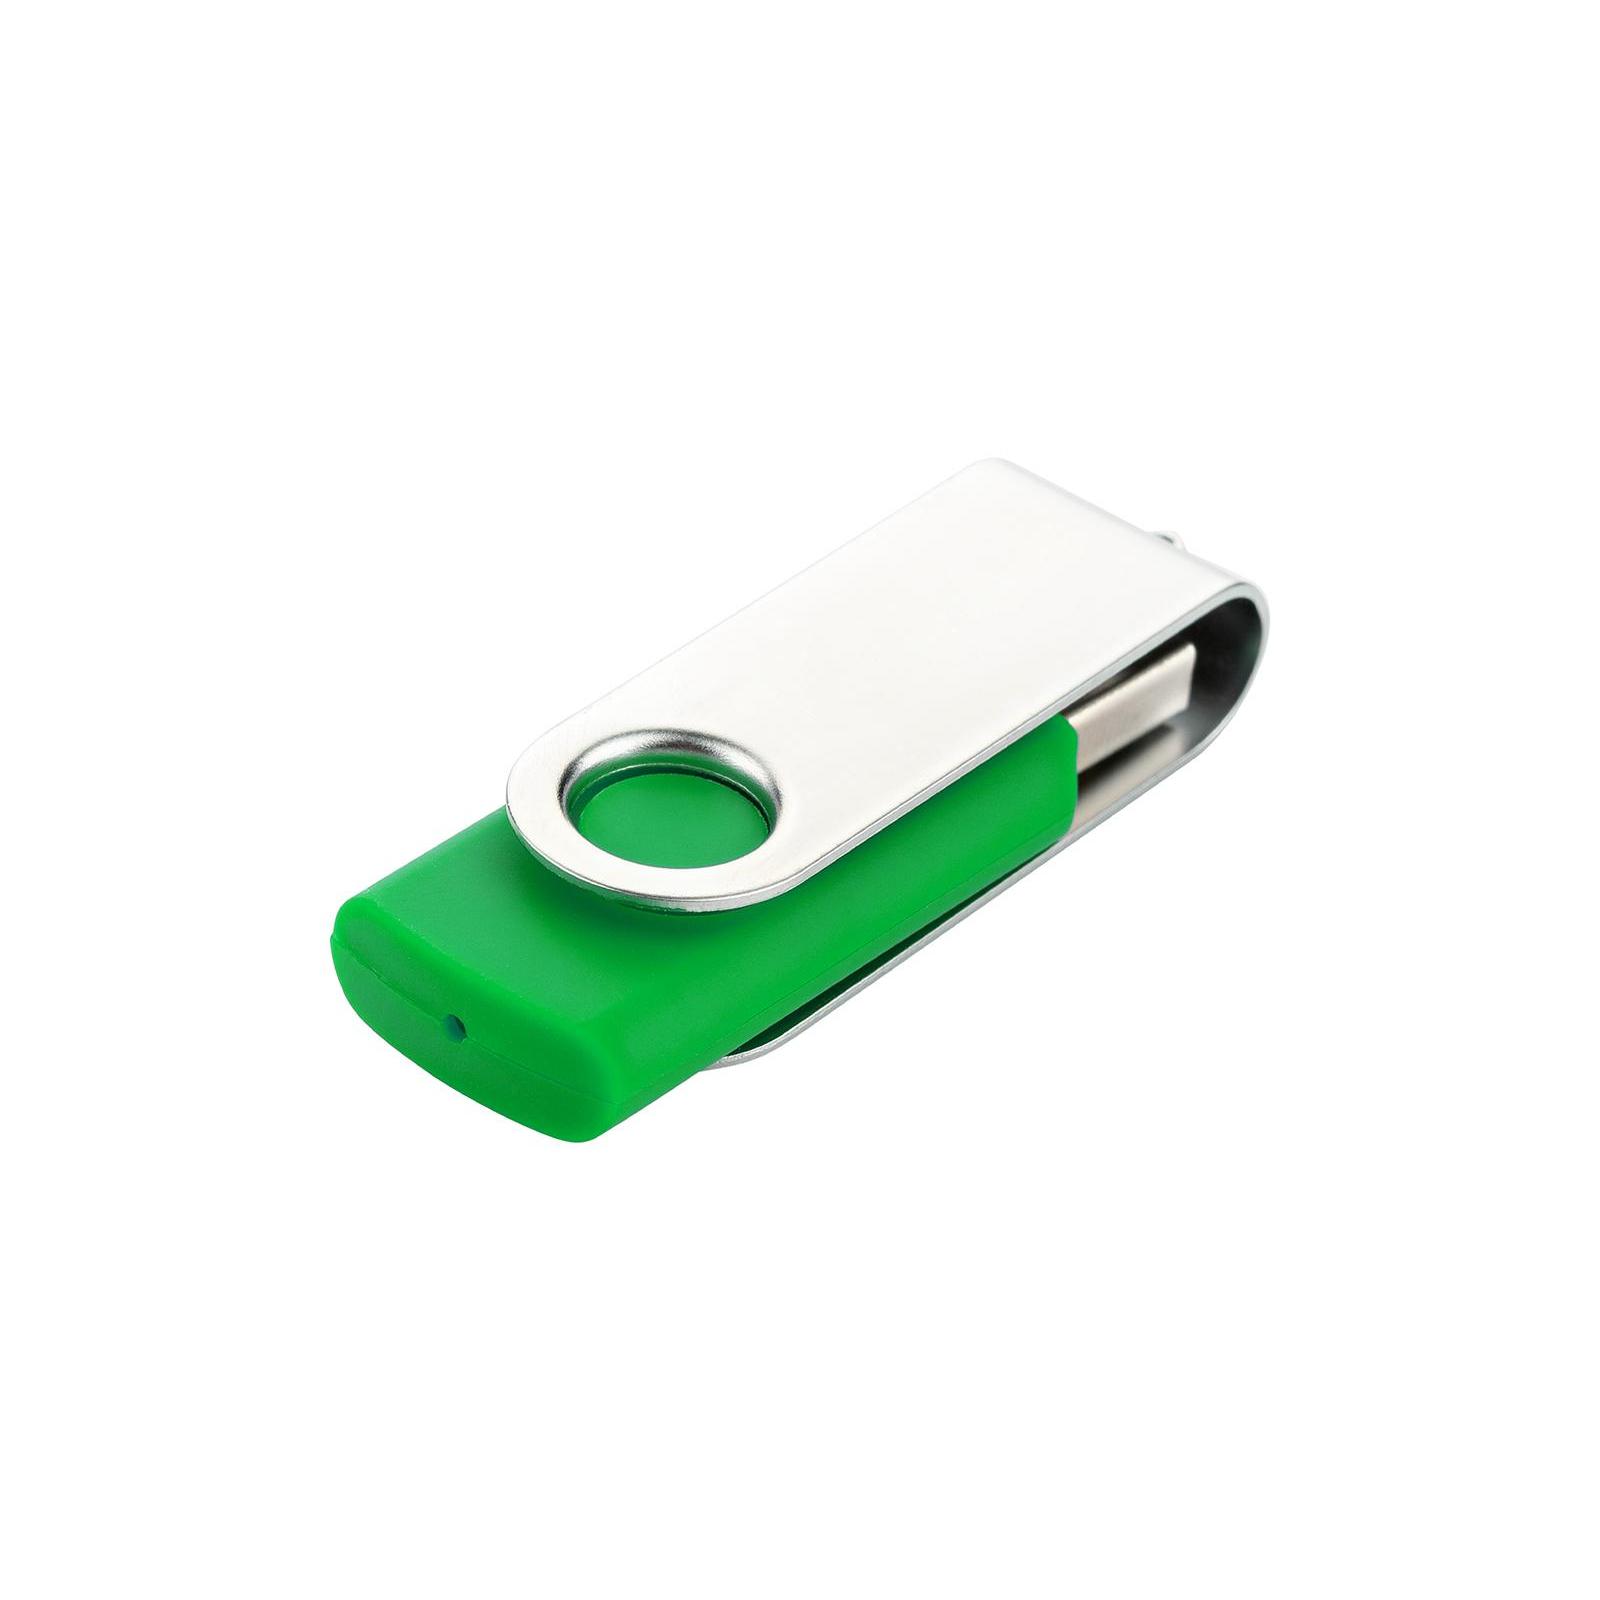 USB флеш накопитель eXceleram 128GB P1 Series Silver/Black USB 3.1 Gen 1 (EXP1U3SIB128) изображение 6